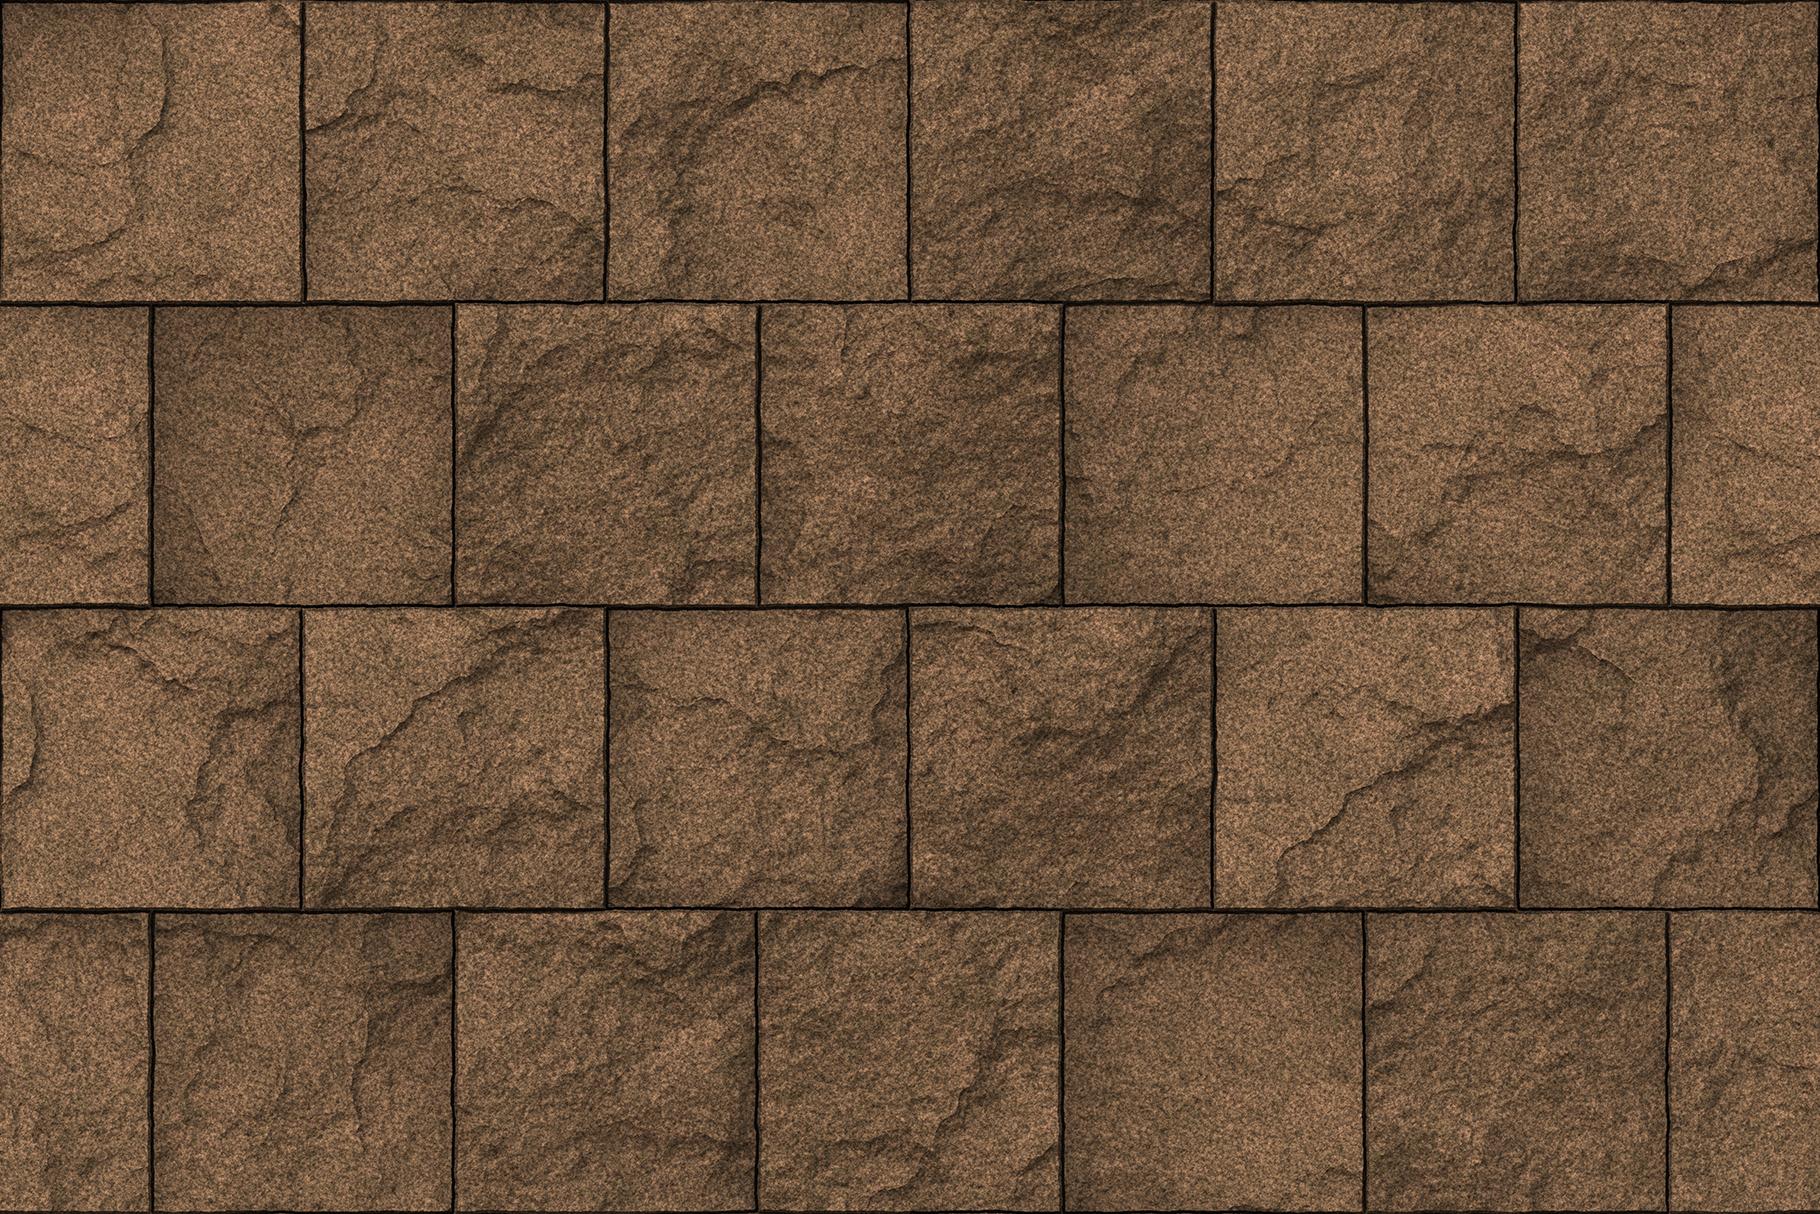 10 Stone Block Wall Textures Textures World